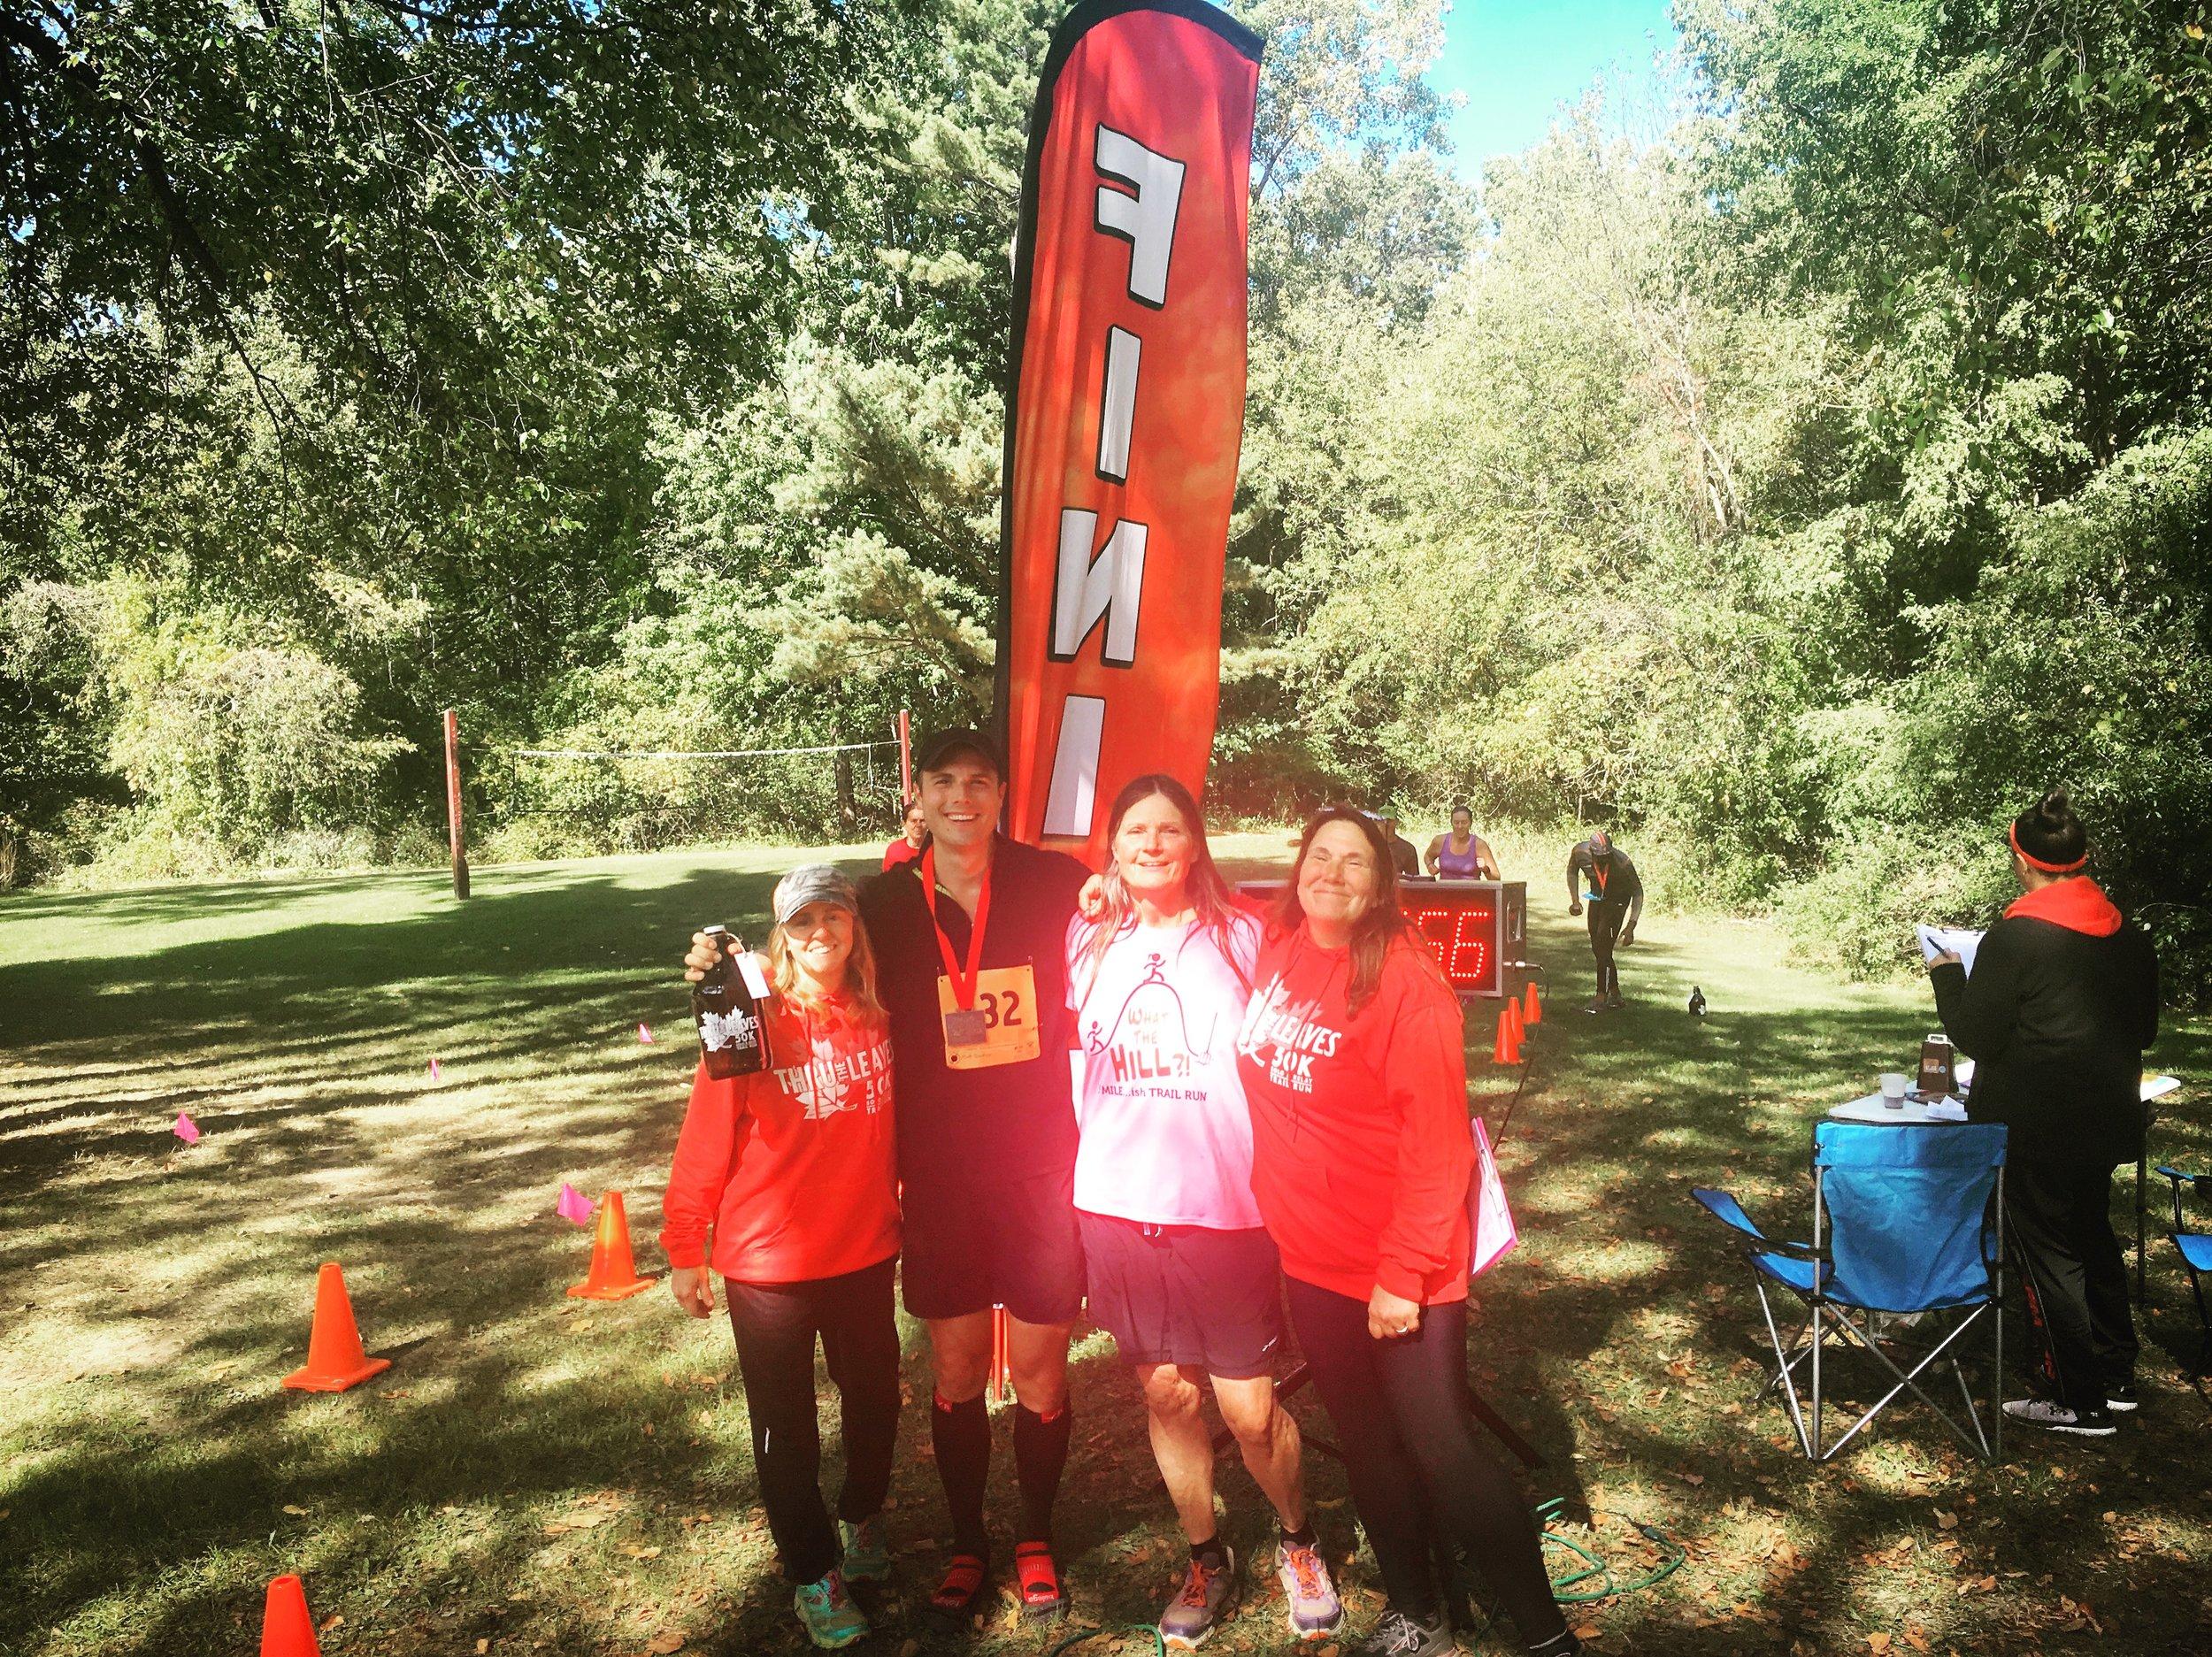 Thru the Leaves Ultra 50k Trail Race